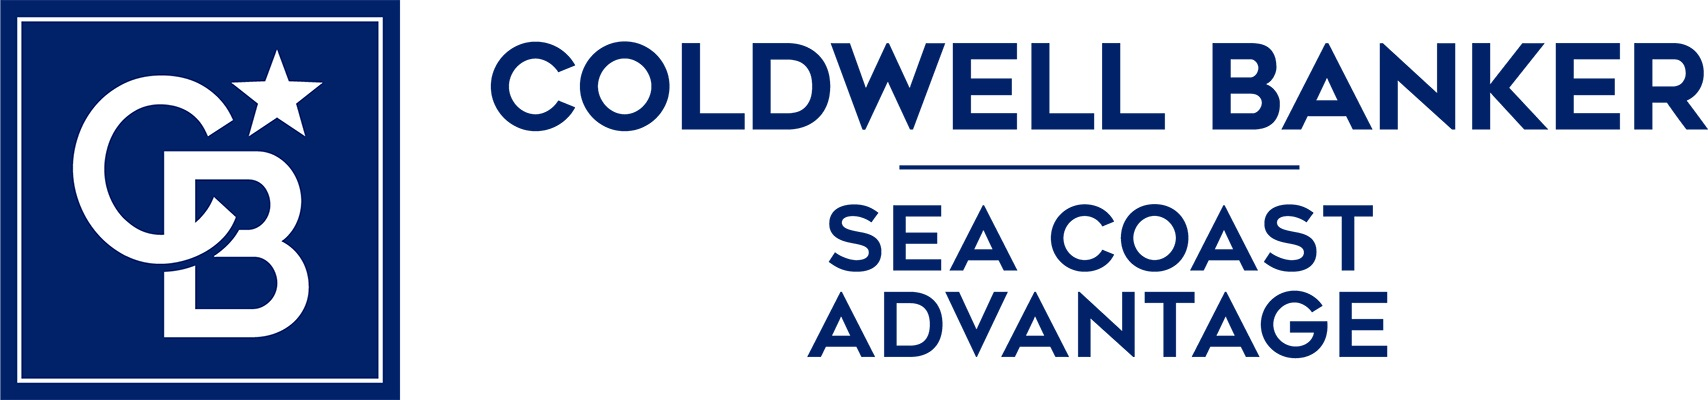 Bonnie Chambers - Coldwell Banker Sea Coast Advantage Realty Logo